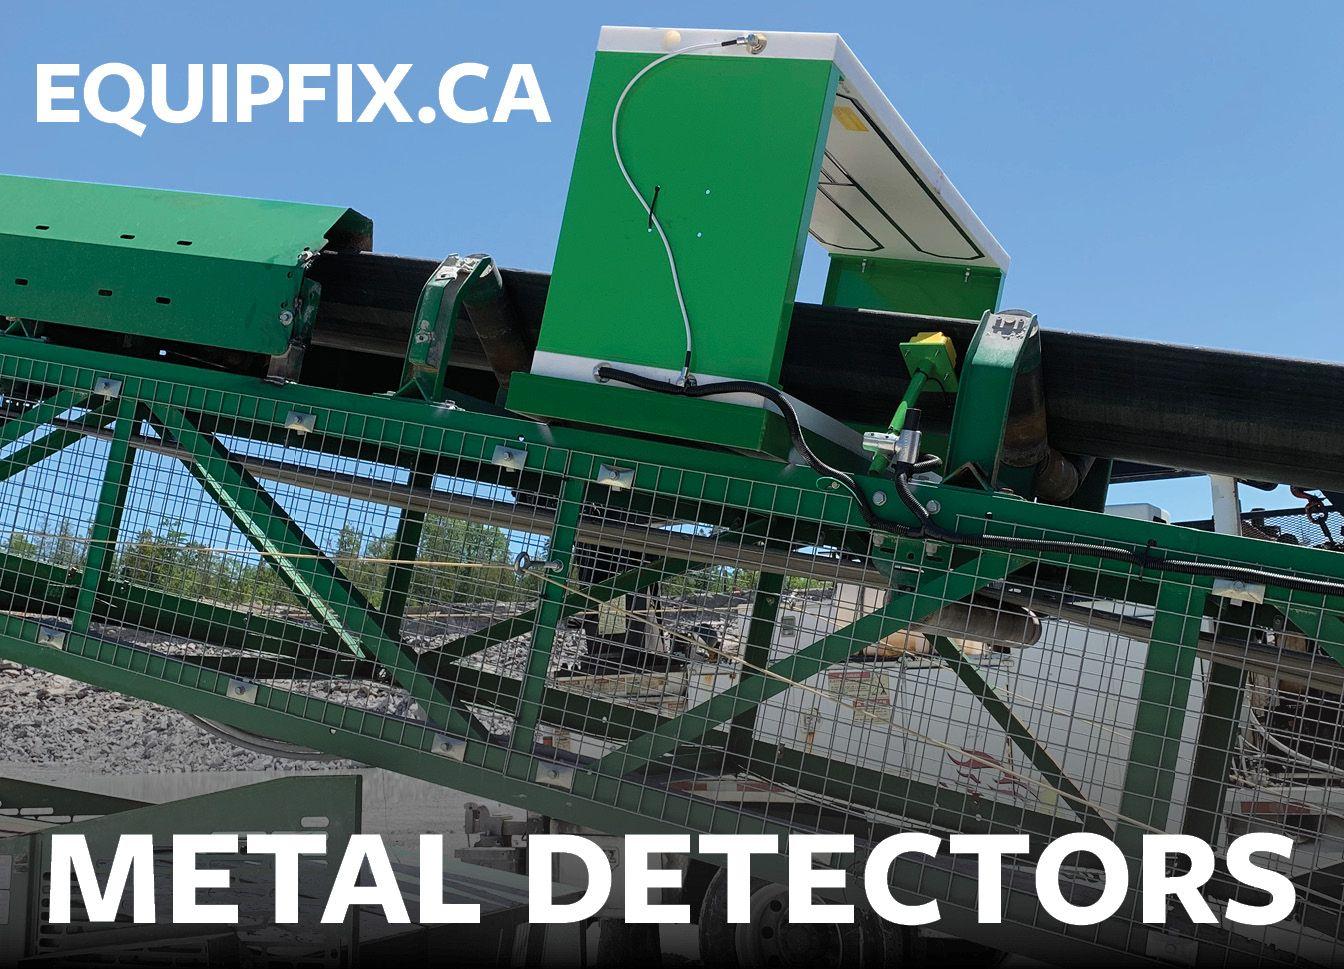 Metal Detector featured image